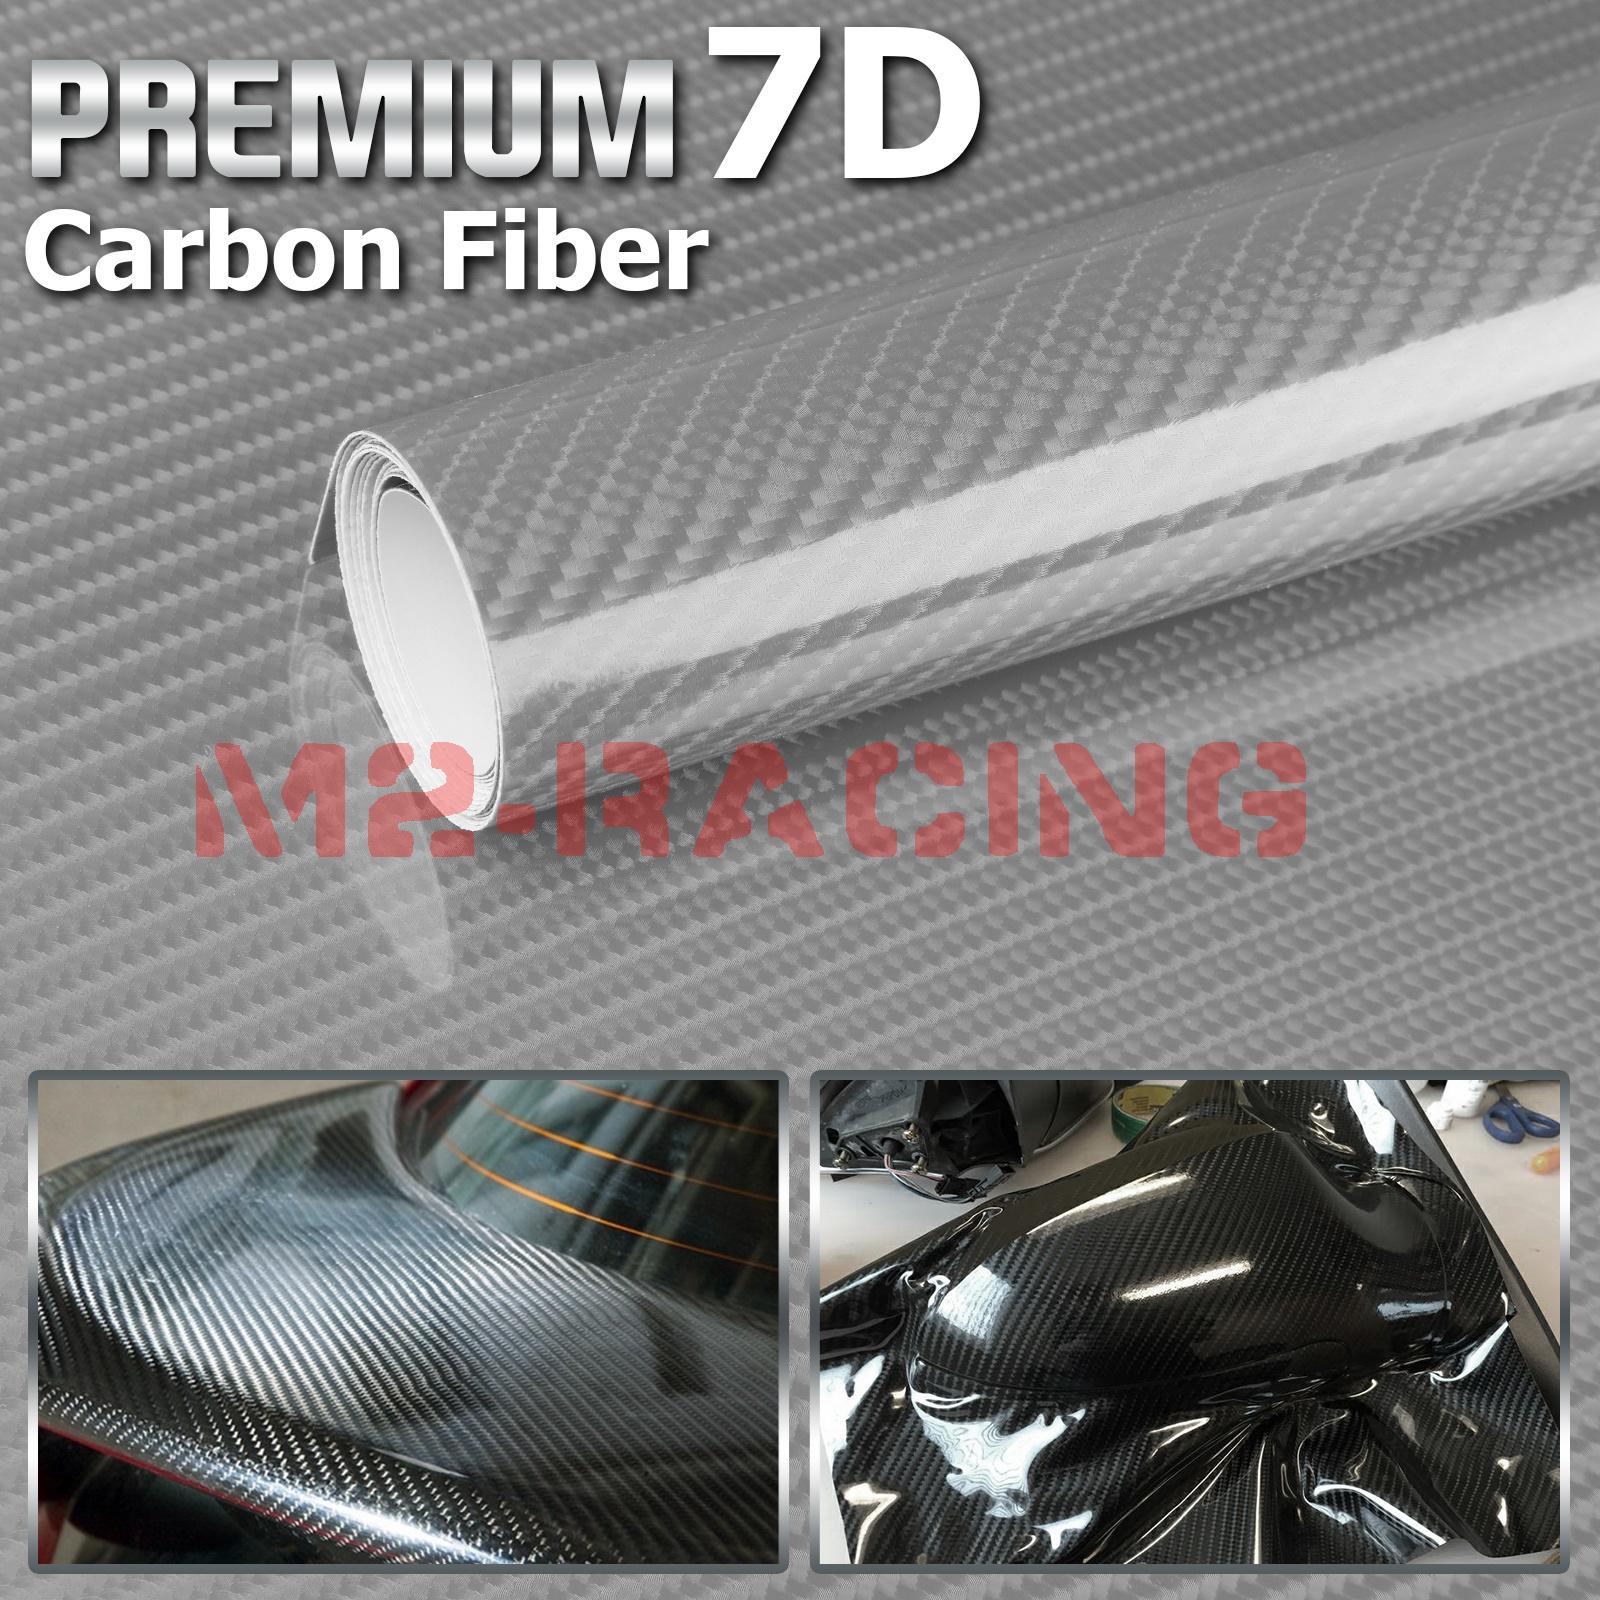 *Premium 7D White High Gloss Carbon Fiber Vinyl Wrap Bubble Free Air Release